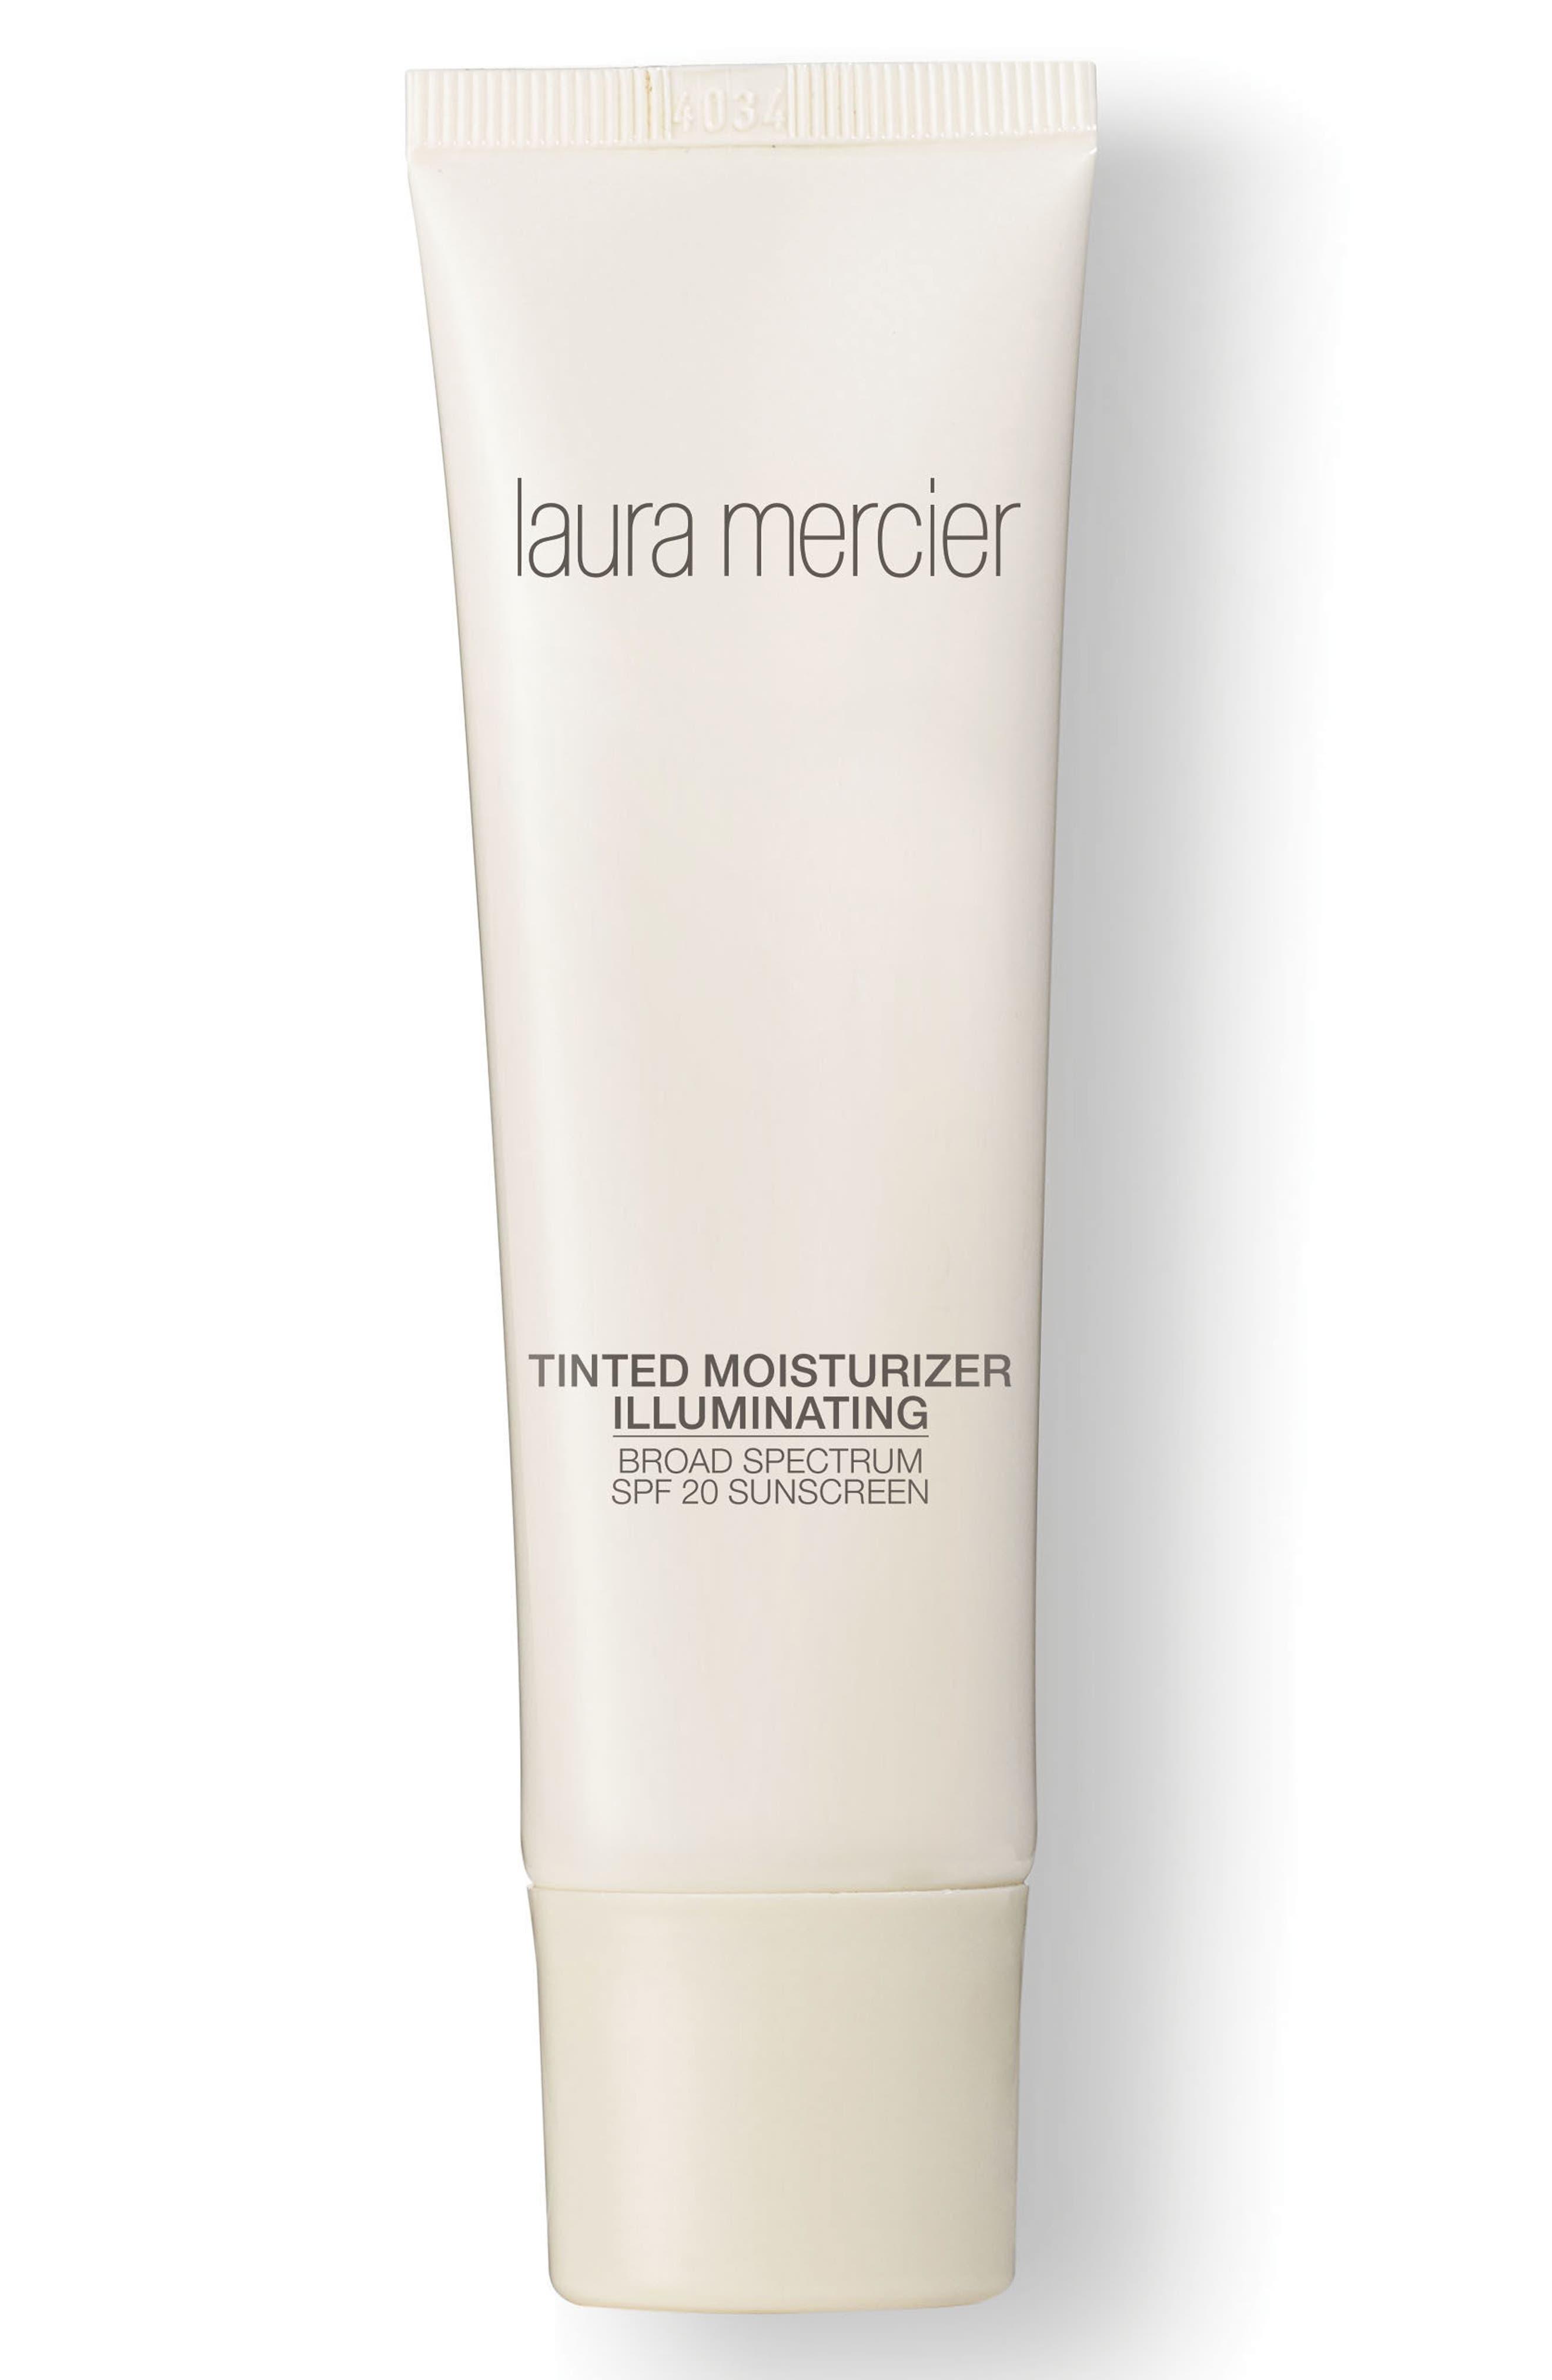 LAURA MERCIER, Illuminating Tinted Moisturizer SPF 20, Main thumbnail 1, color, 1N1 BARE RADIANCE